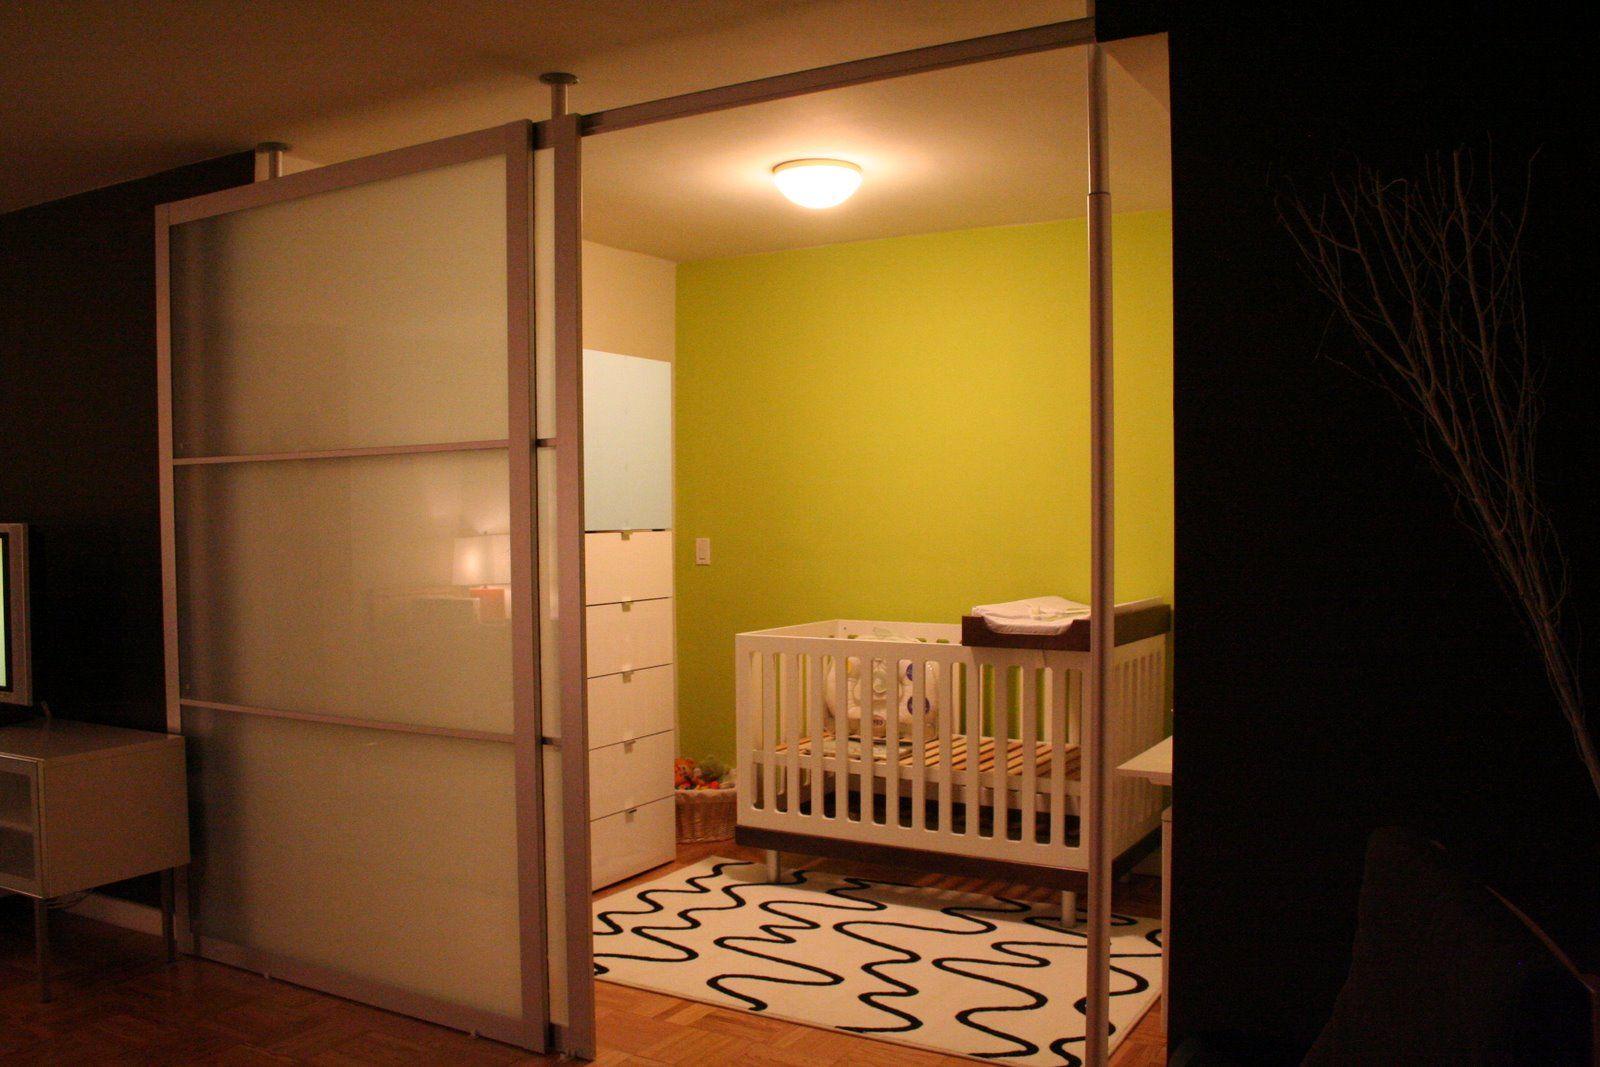 Room Divider Using Stolman Poles And Ikea Sliding Doors Ikea